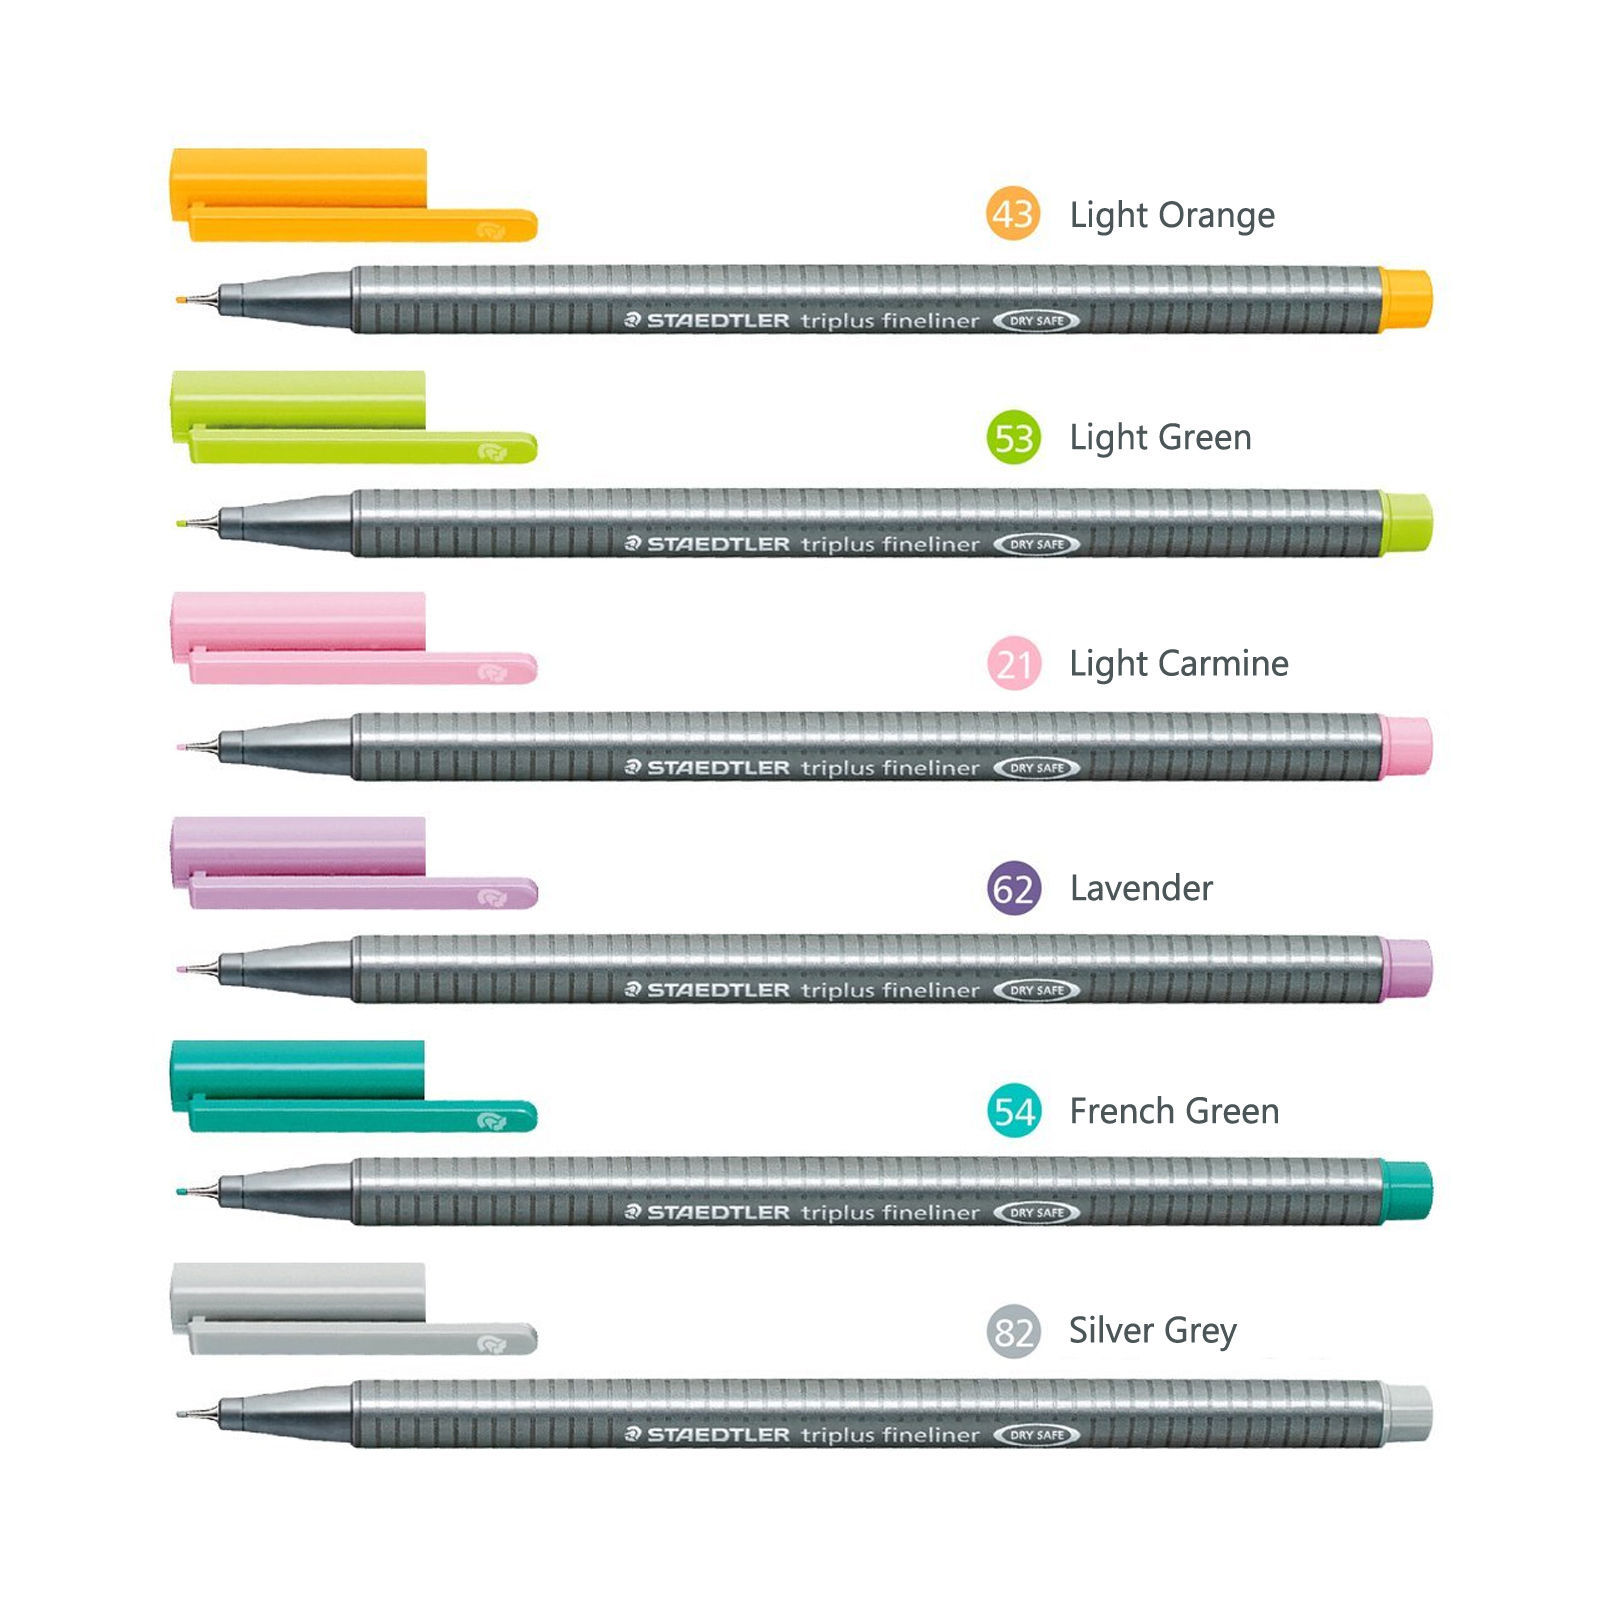 Staedtler-Triplus-Fineline-Pens-03mm-PASTEL-COLOURS-6-Pack-Desktop-Box-NEW-152272651109-2